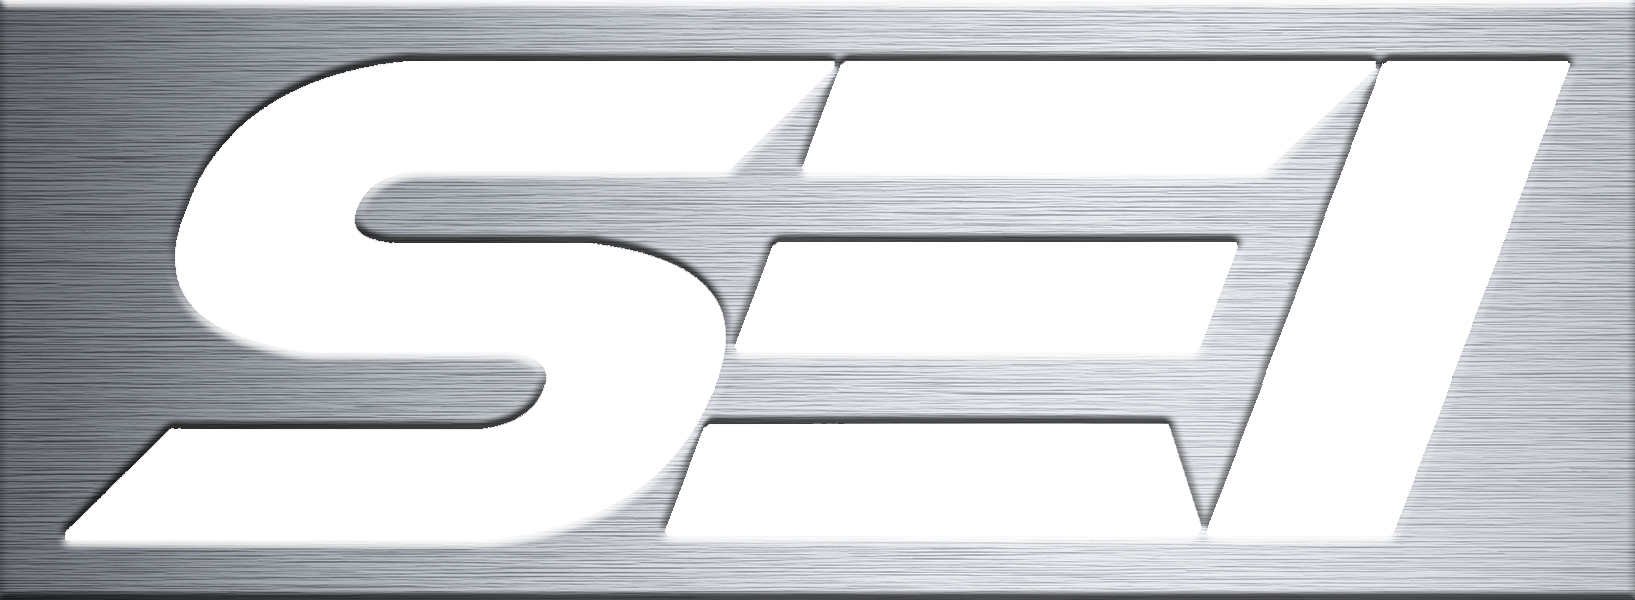 SEI_logo_61_trans_1_metal_emboss